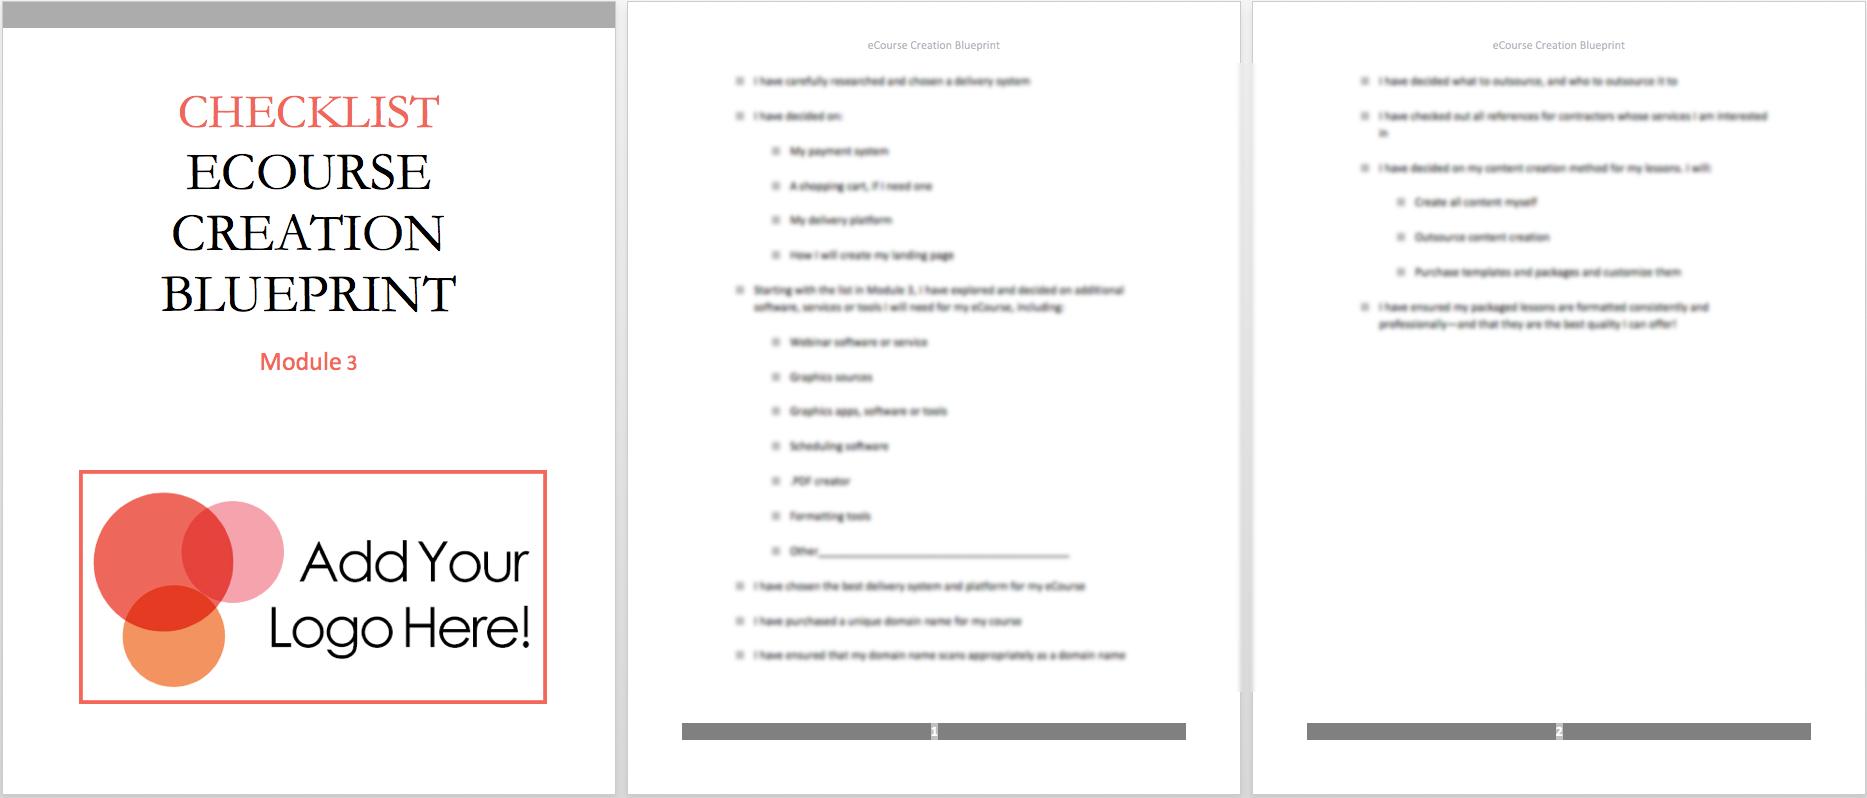 mod-3-checklist